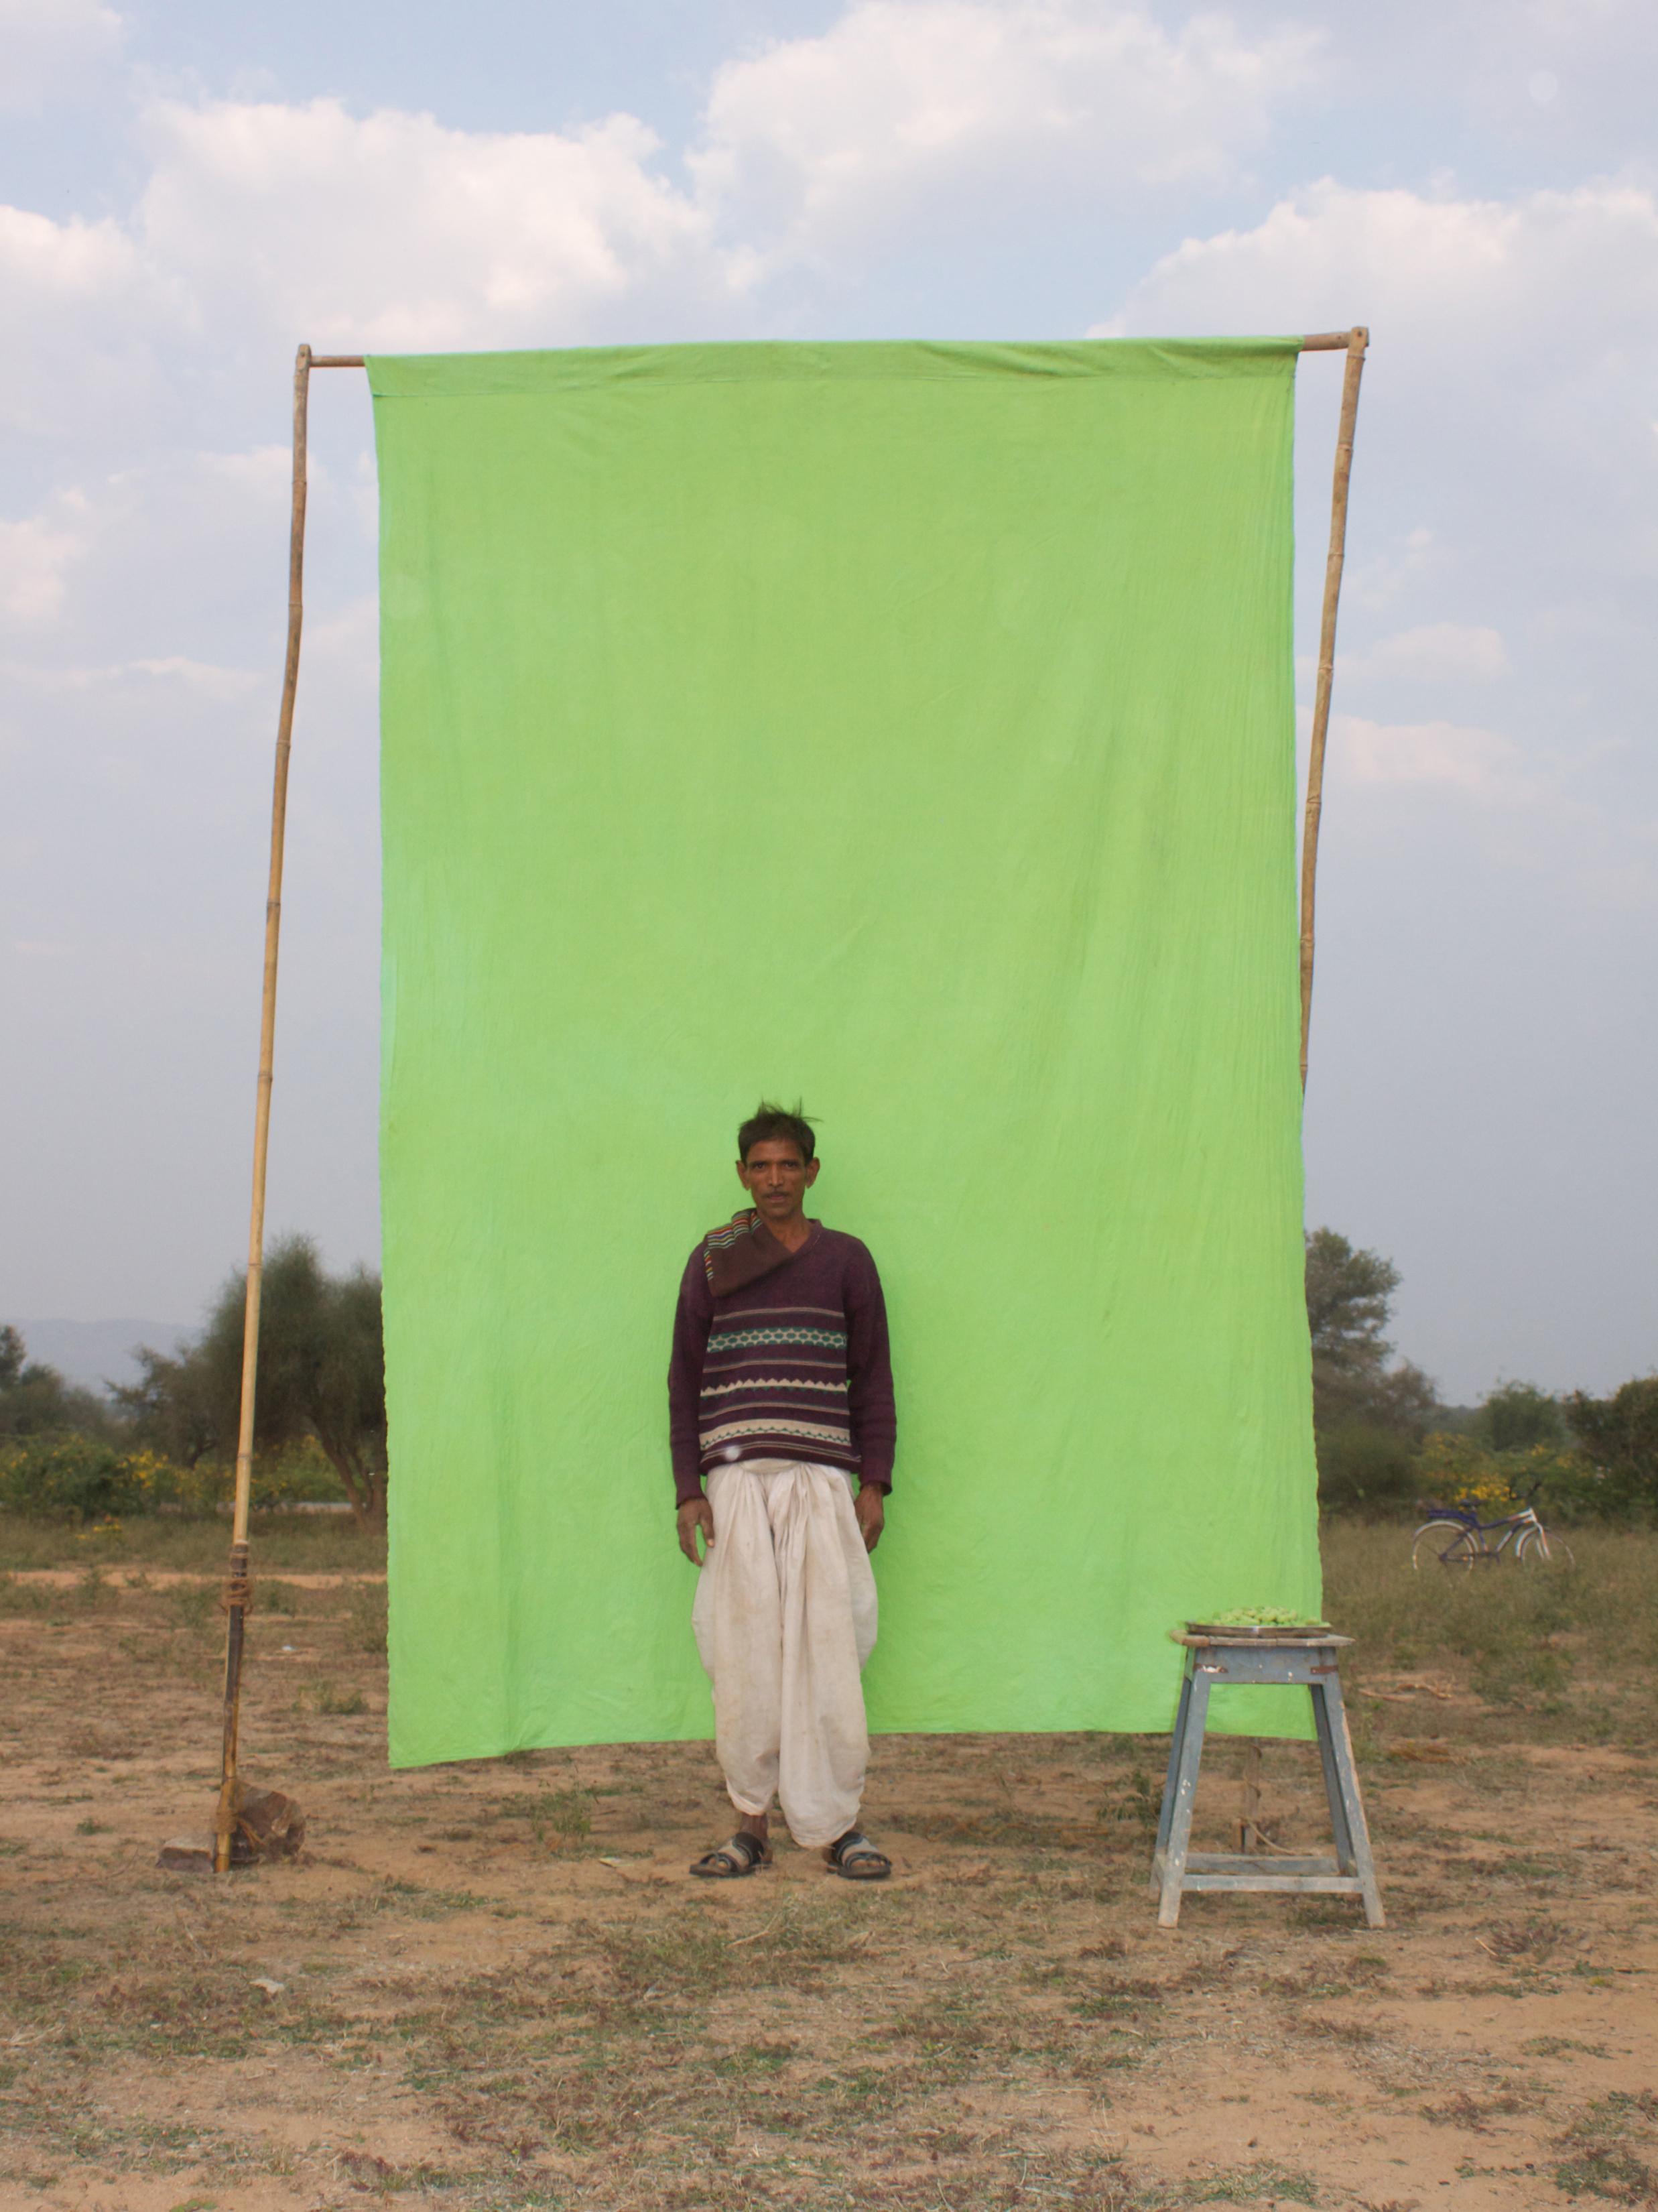 Benjamin Faga   Chroma Green No. 30    C-print    30 x 40 inches